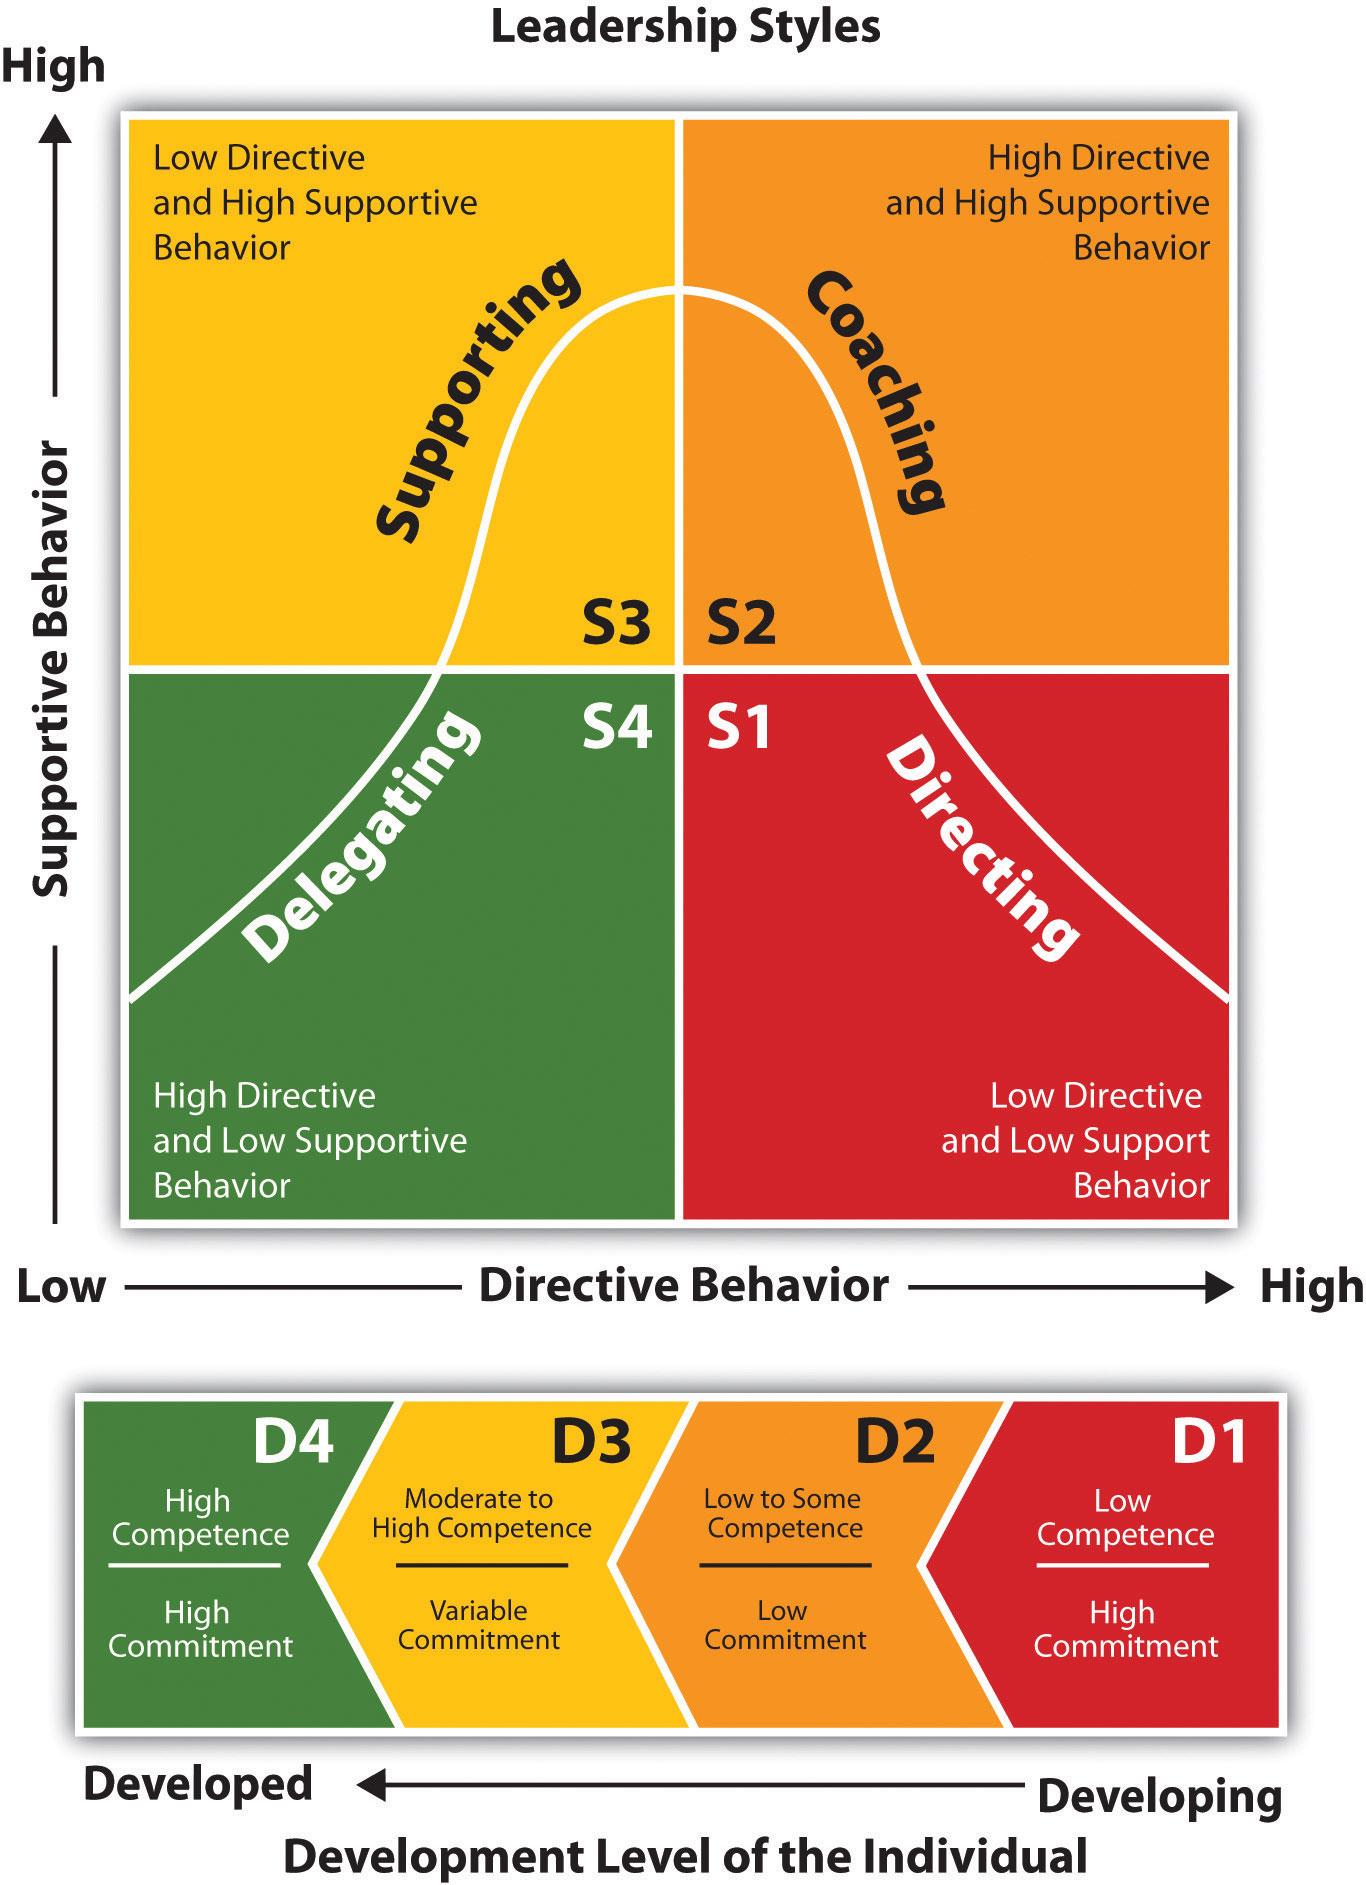 Blanchard's Situational Leadership Model